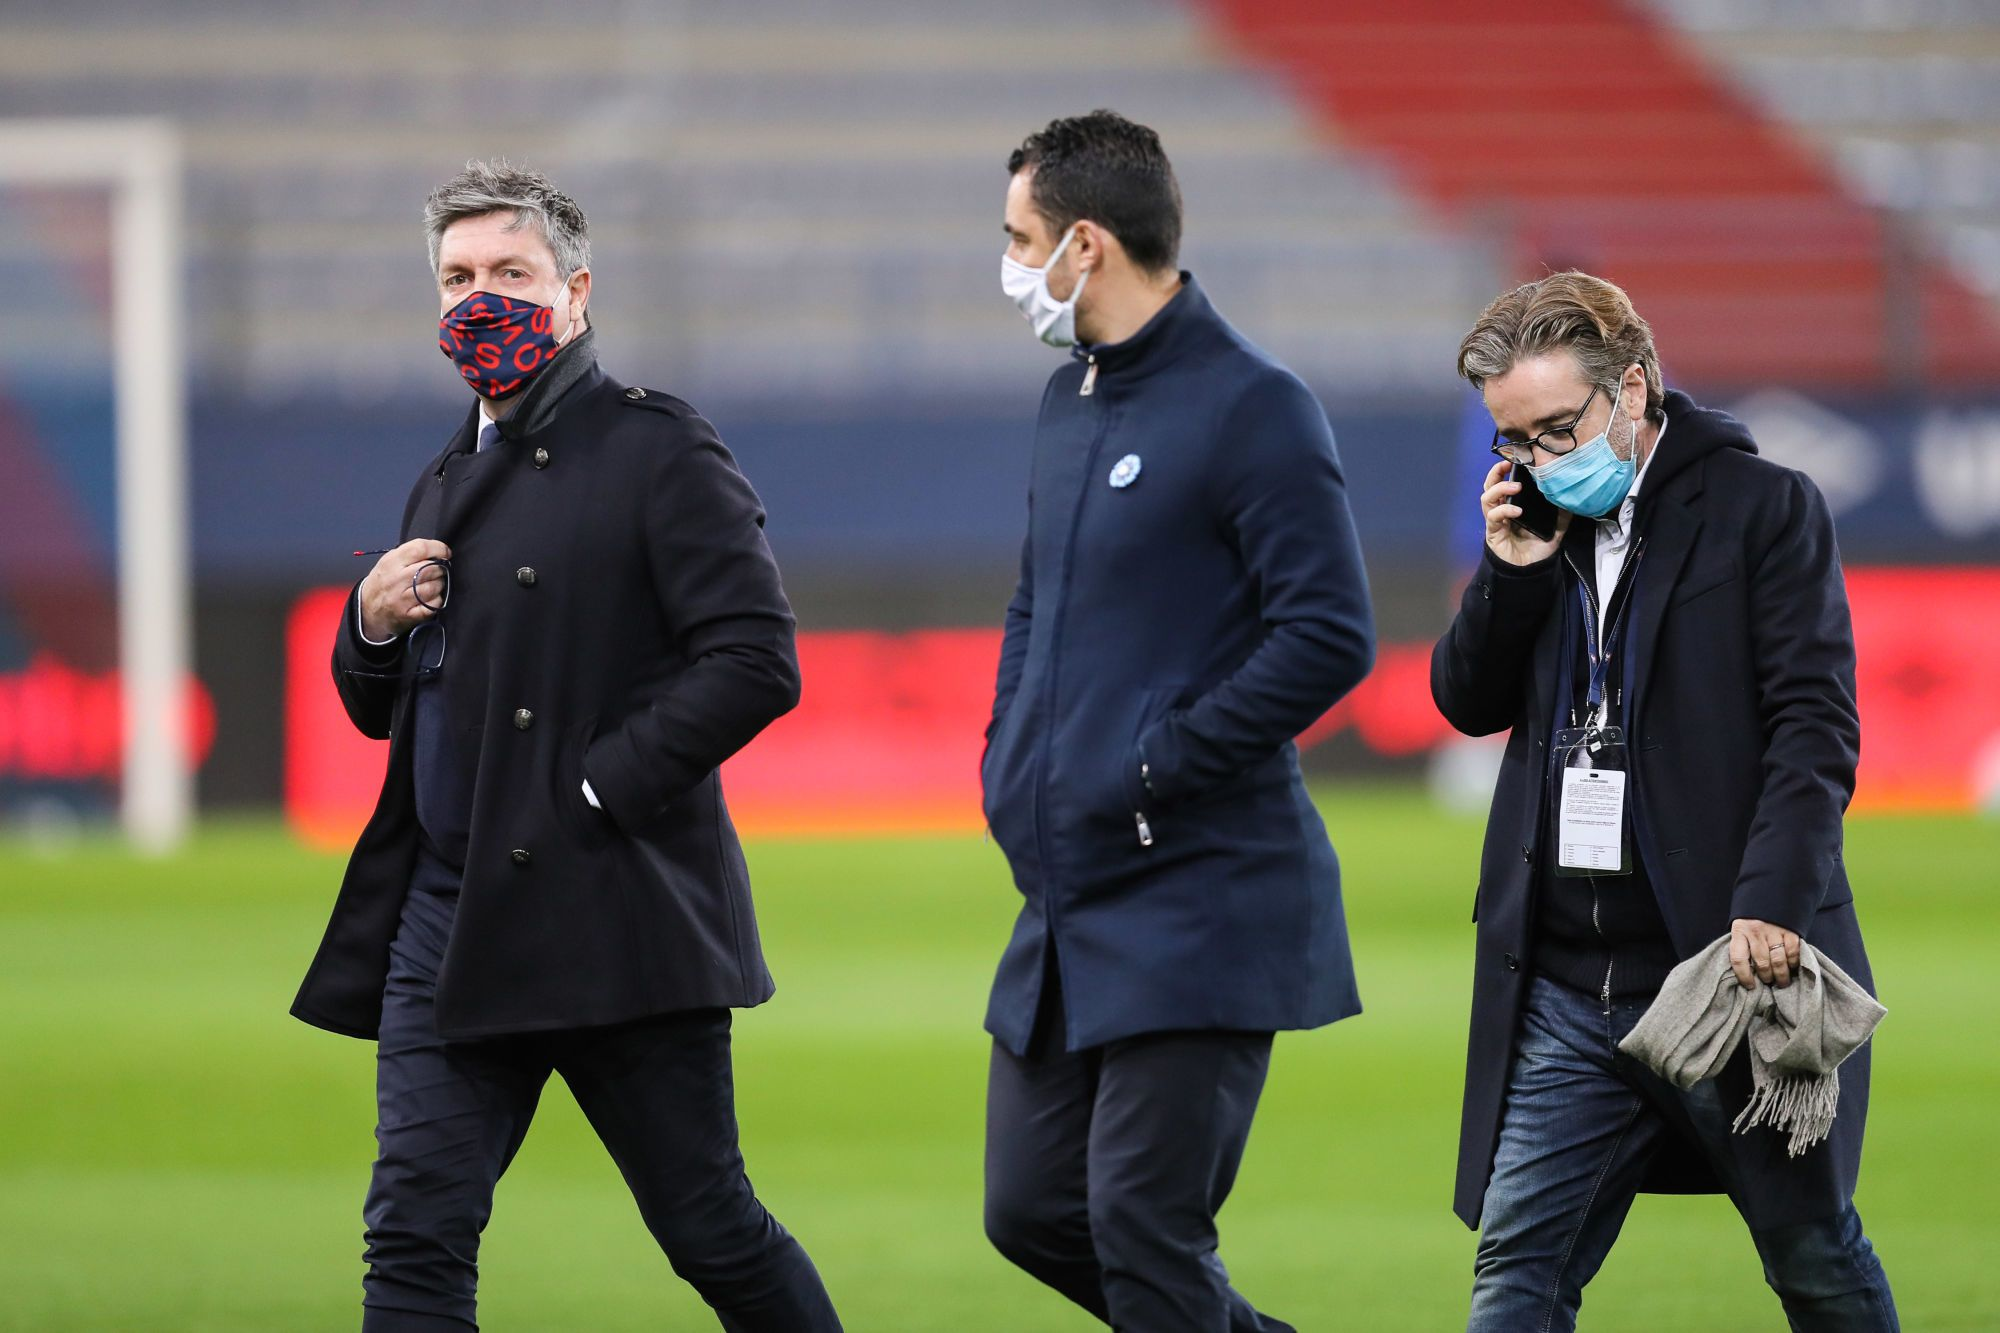 Olivier Pickeu : « Ce n'est pas l'image qu'on veut renvoyer » (France Bleu)